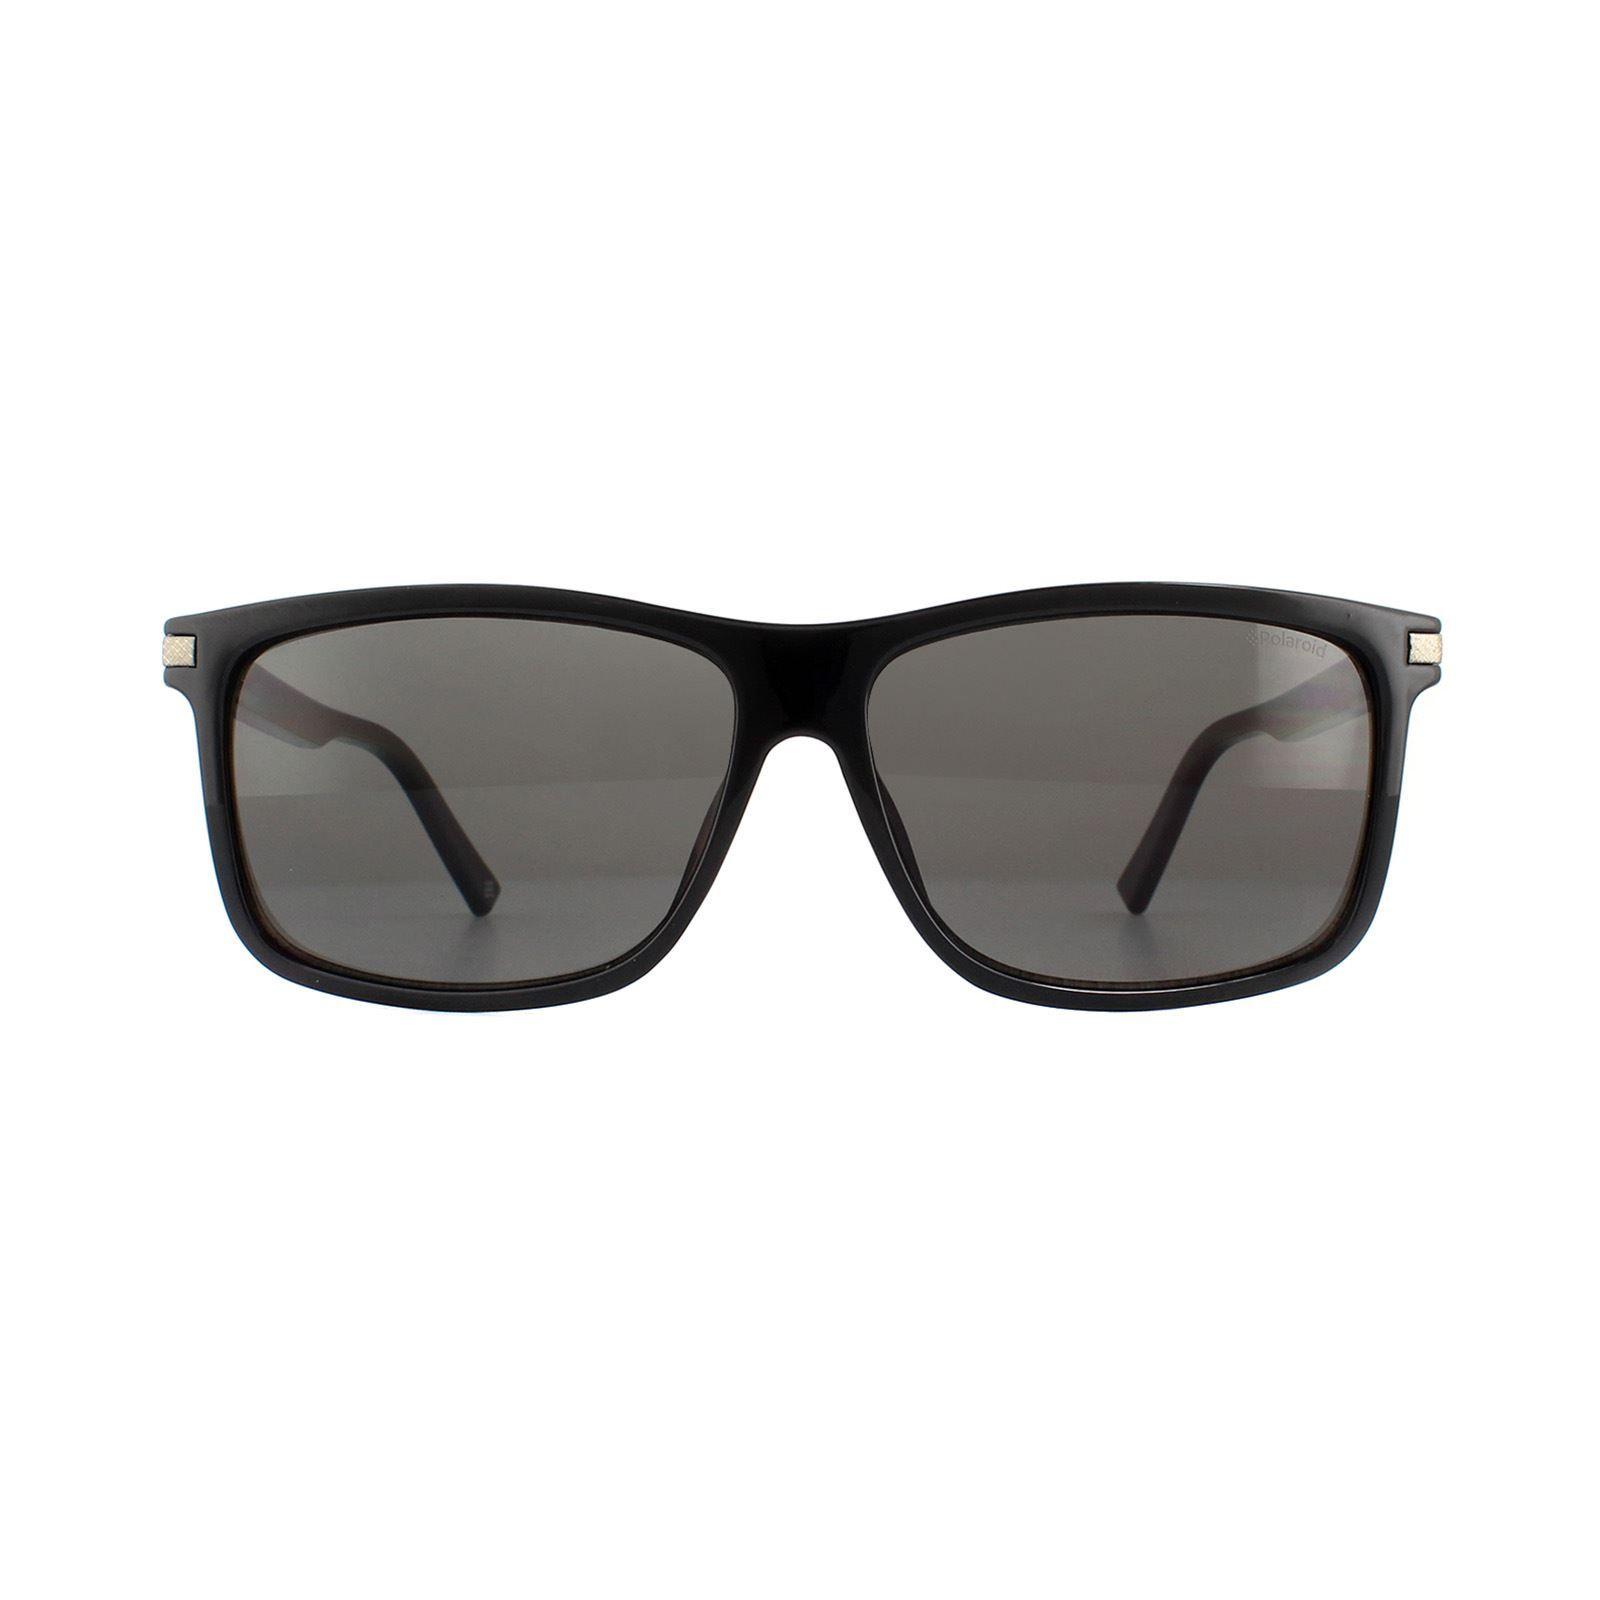 Polaroid Sunglasses PLD 2075/S/X 807 M9 Black Grey Polarized